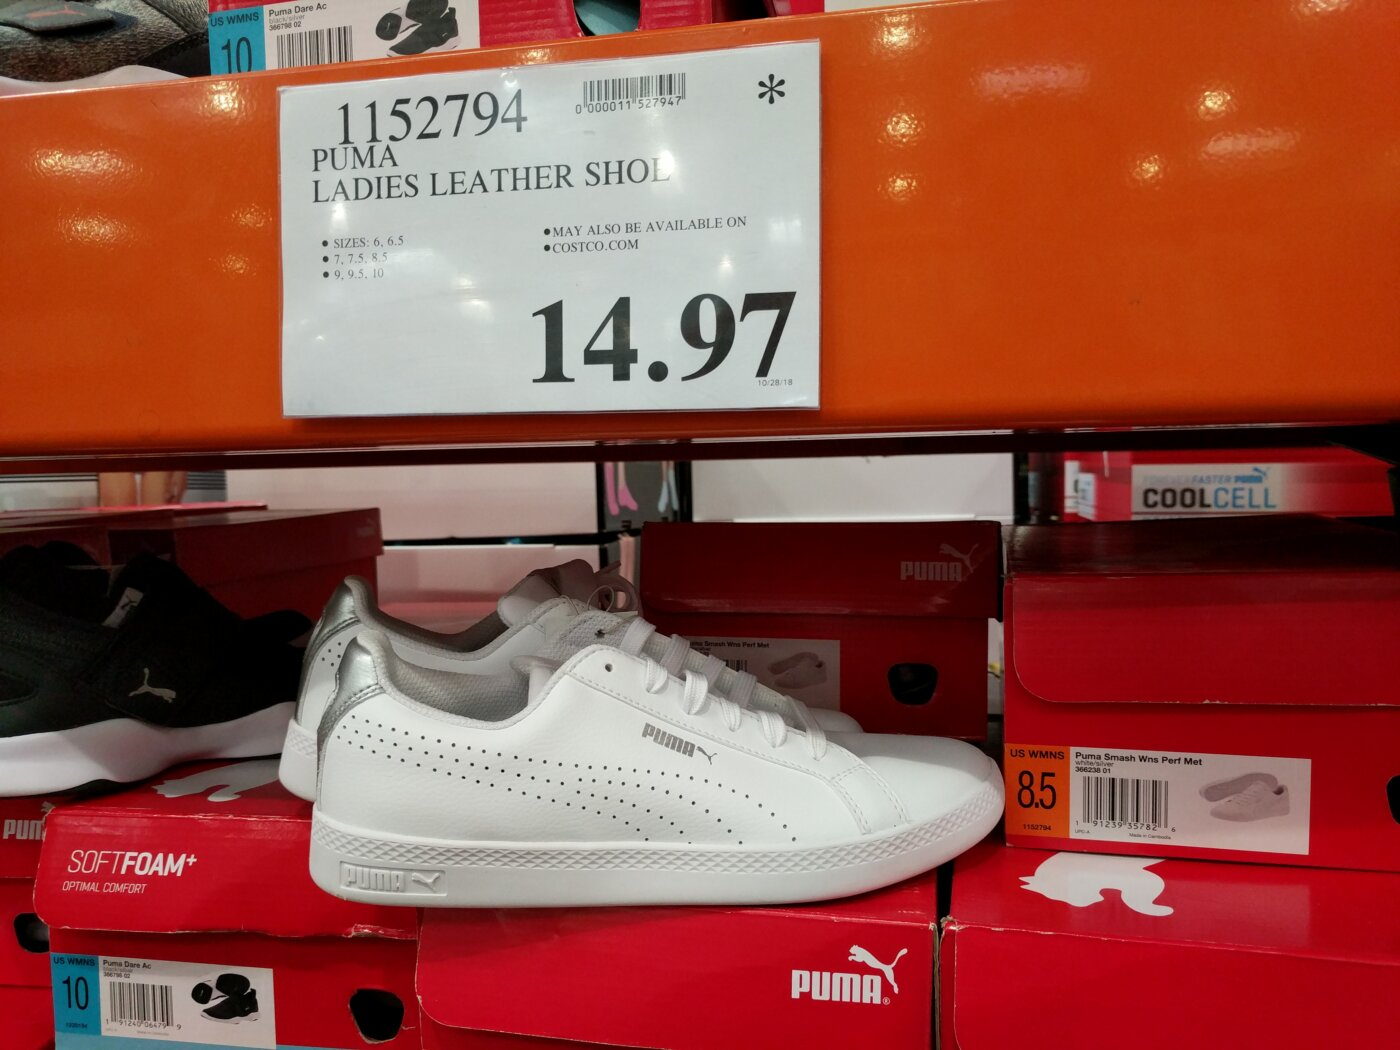 c81c18c0cab8 netherlands puma leather shoes costco 0a575 56eb7